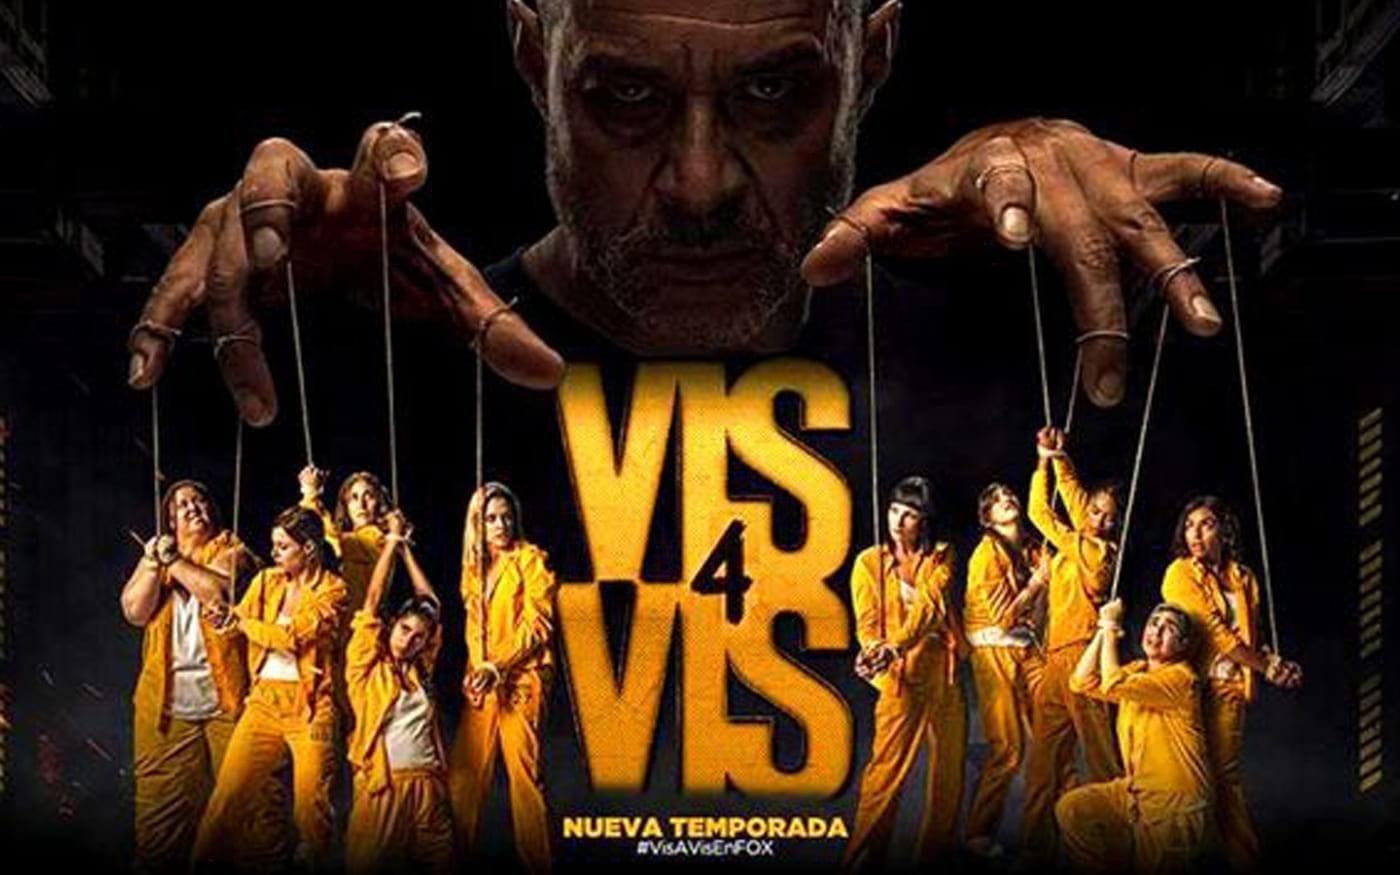 Series: Vis a Vis (Locked Up) Season 4 Episode 1 – 8 Complete